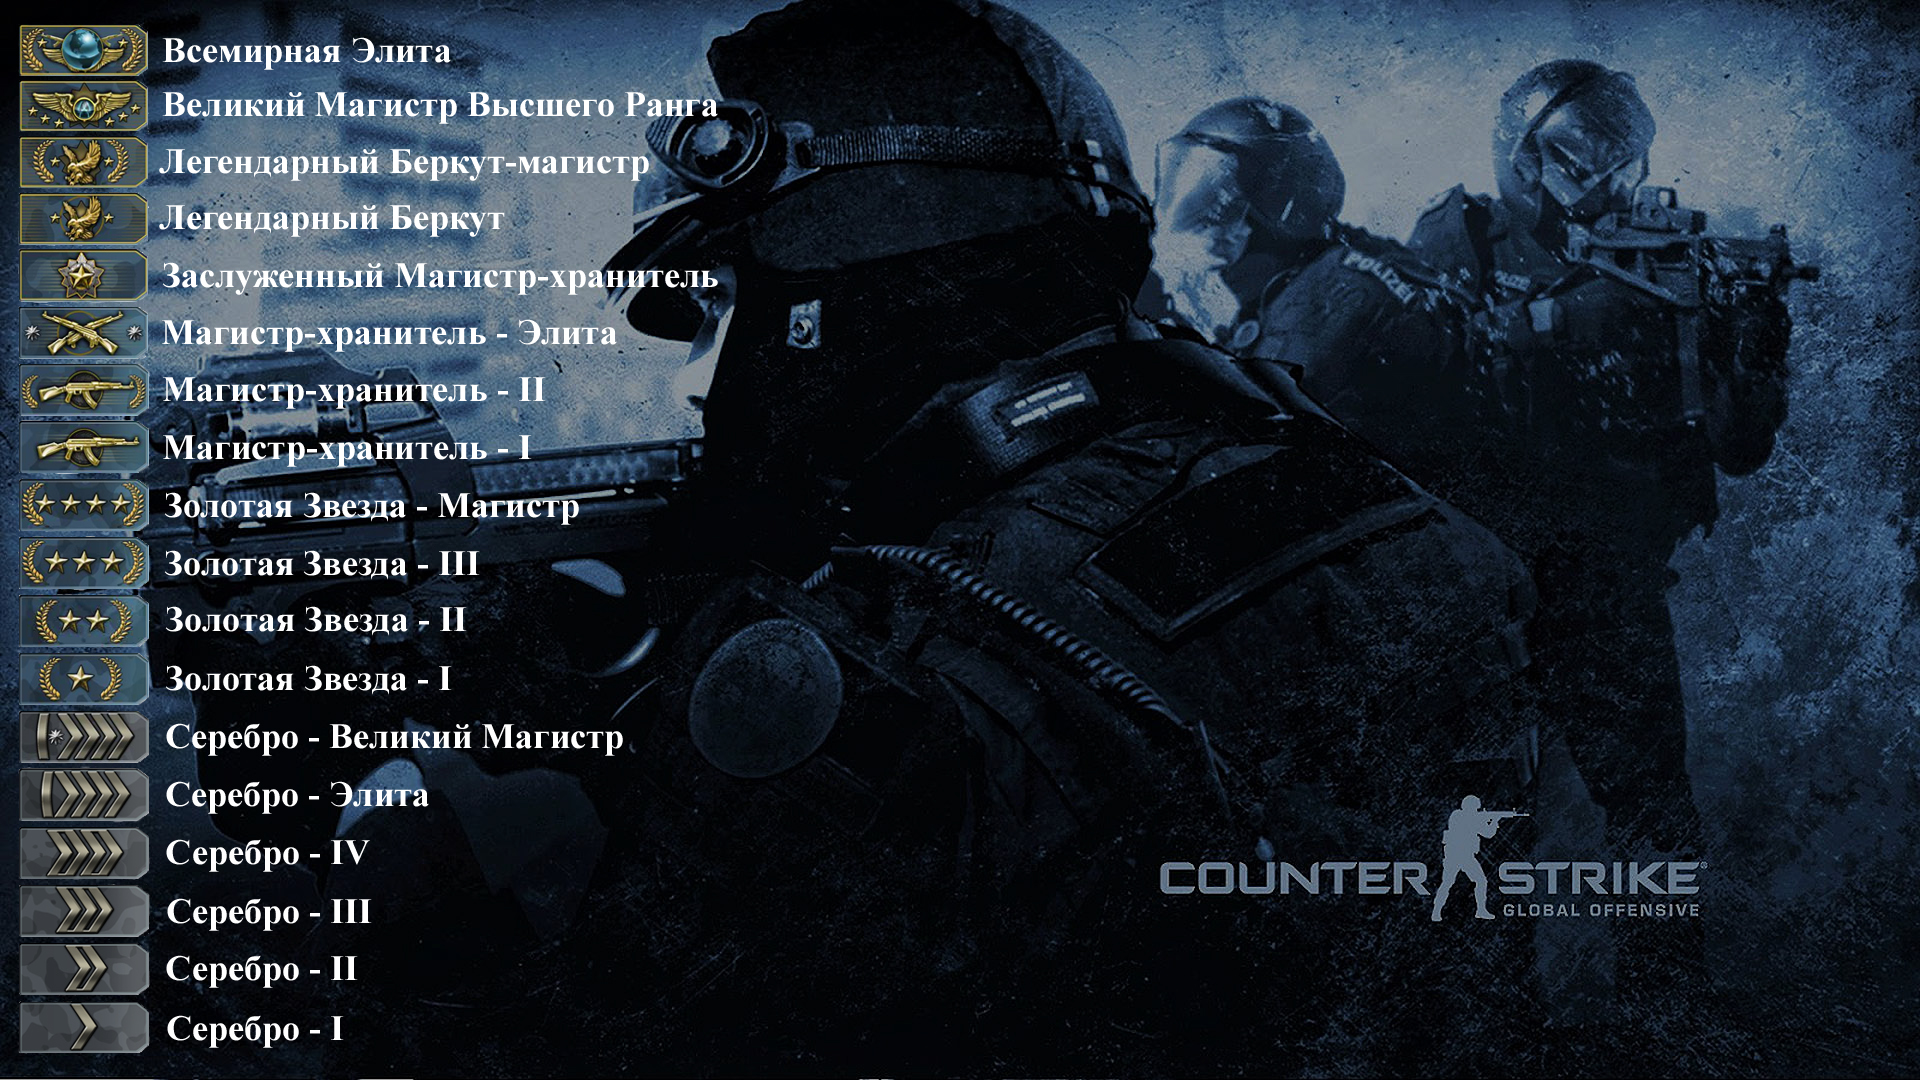 Немного о системе прокачки ранга в Counter Strike: Global Offensive